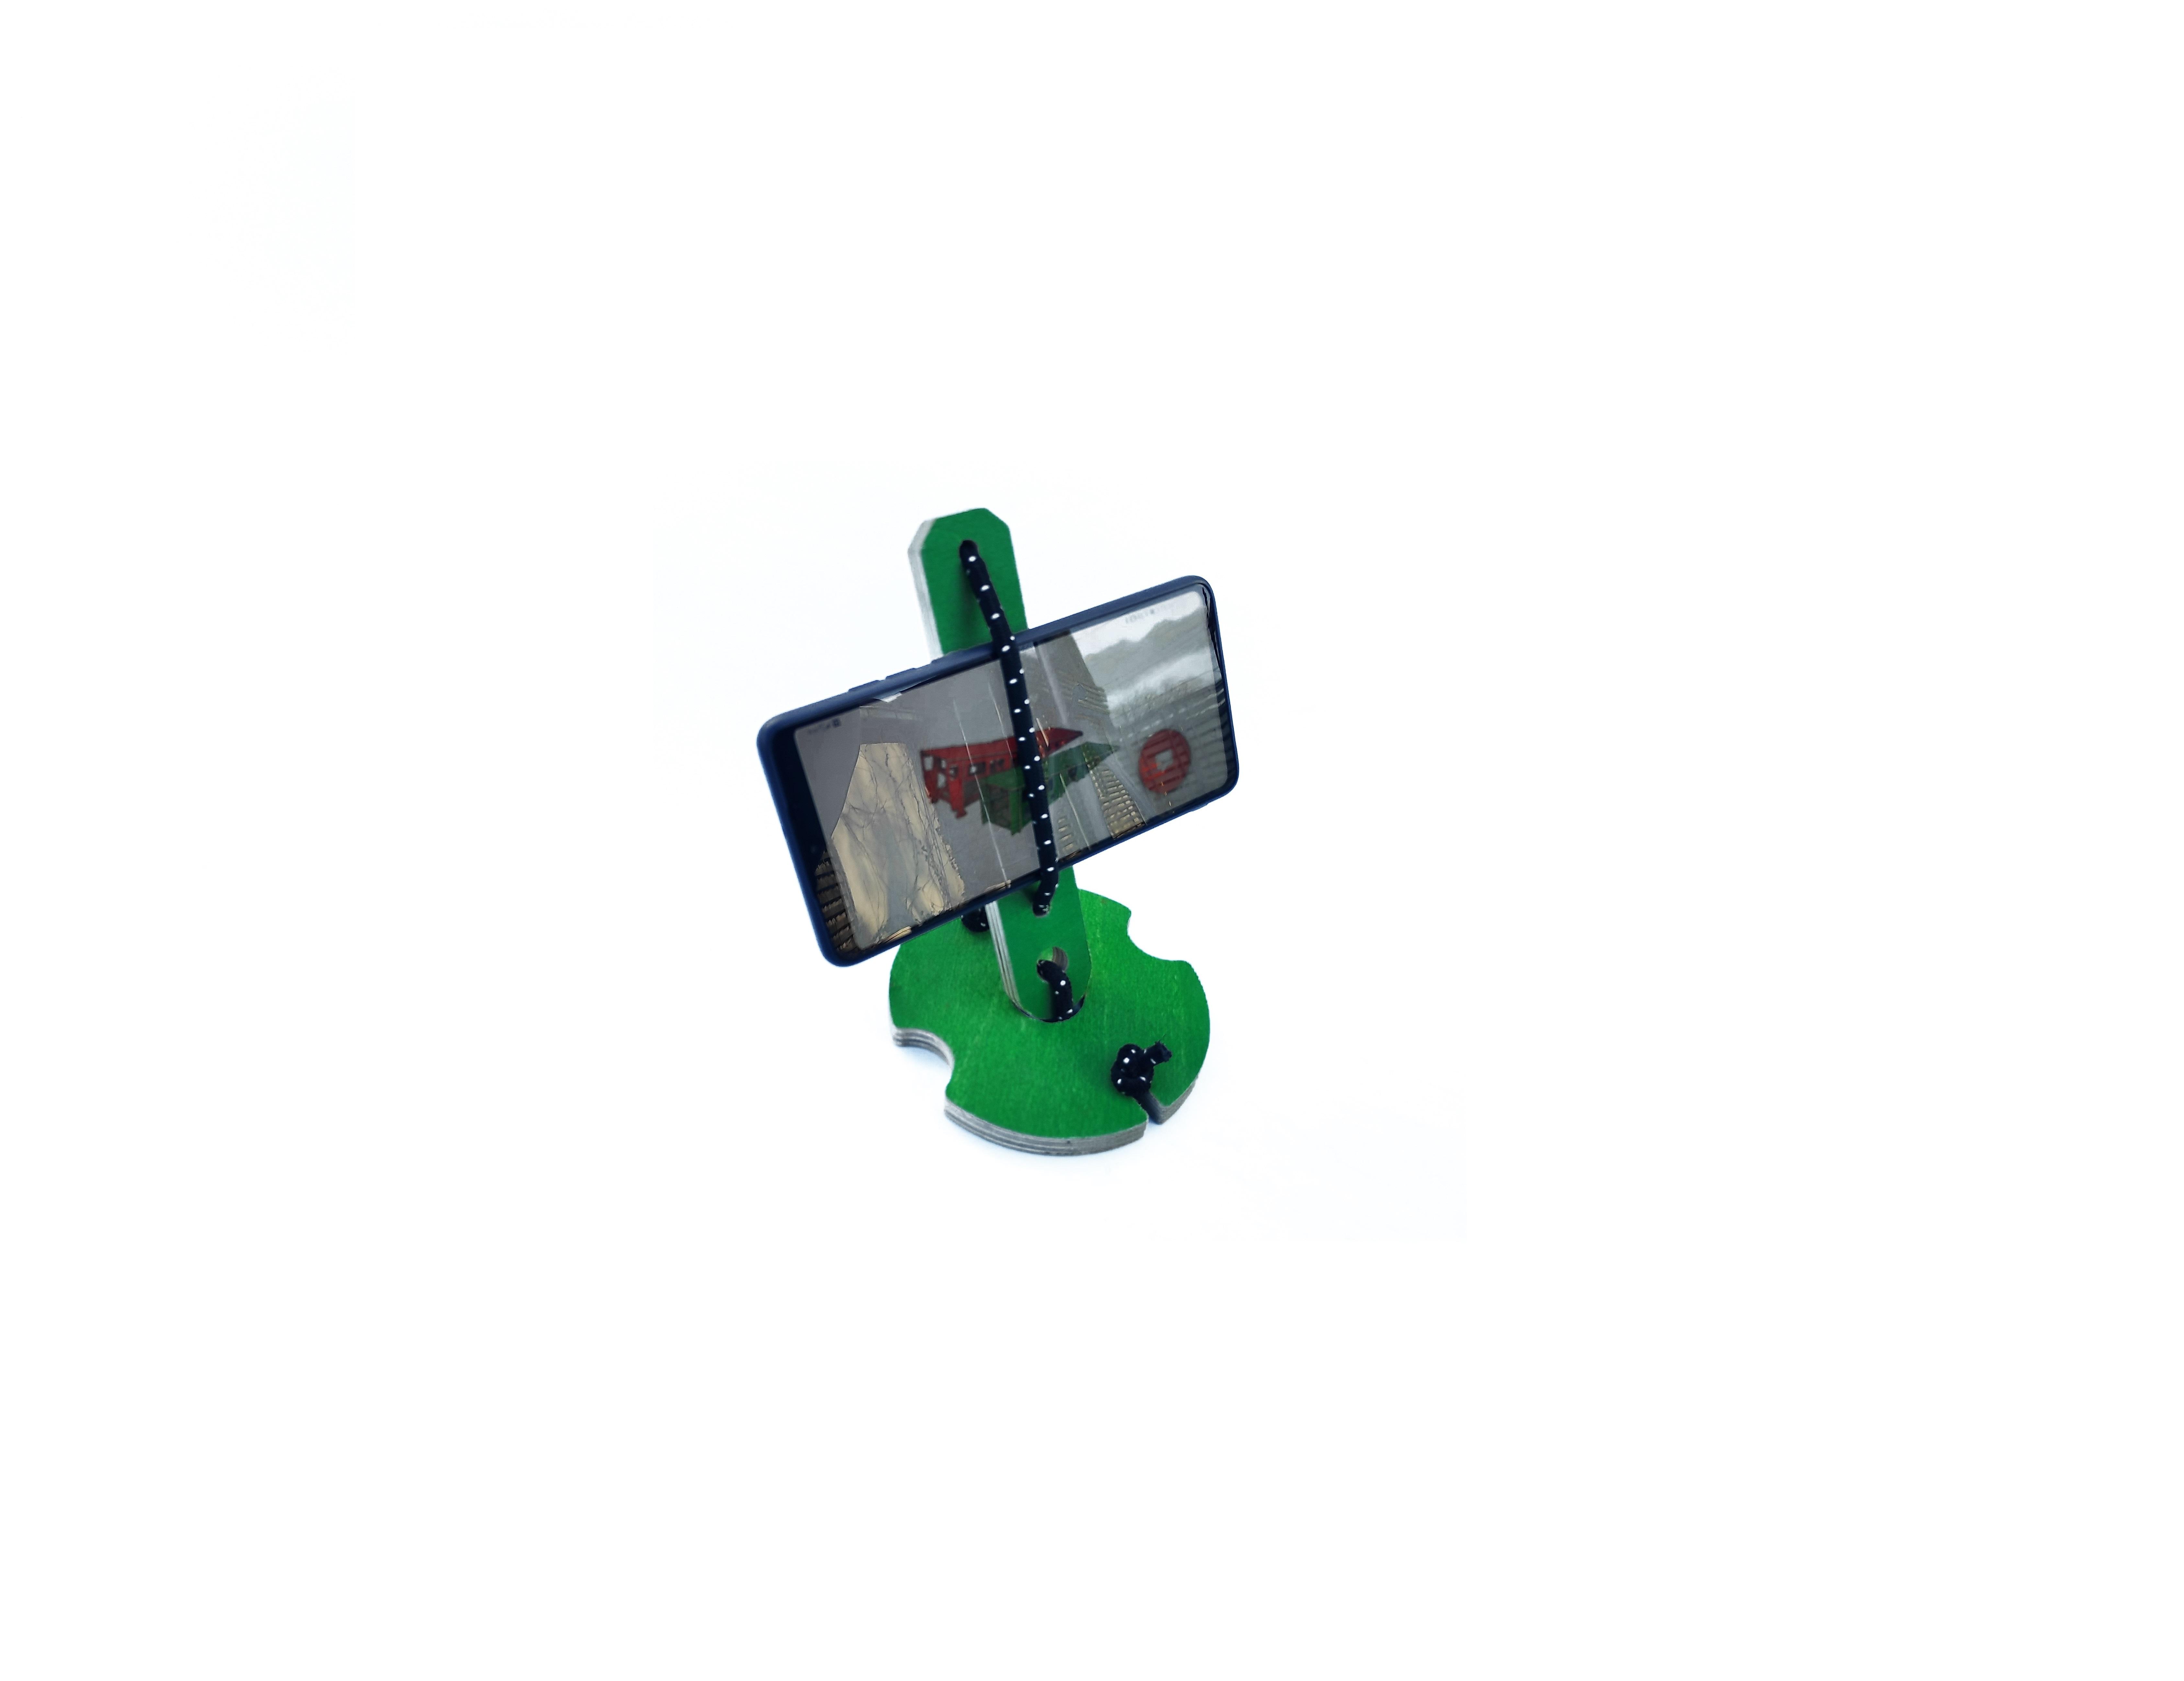 Phone holder Byclex